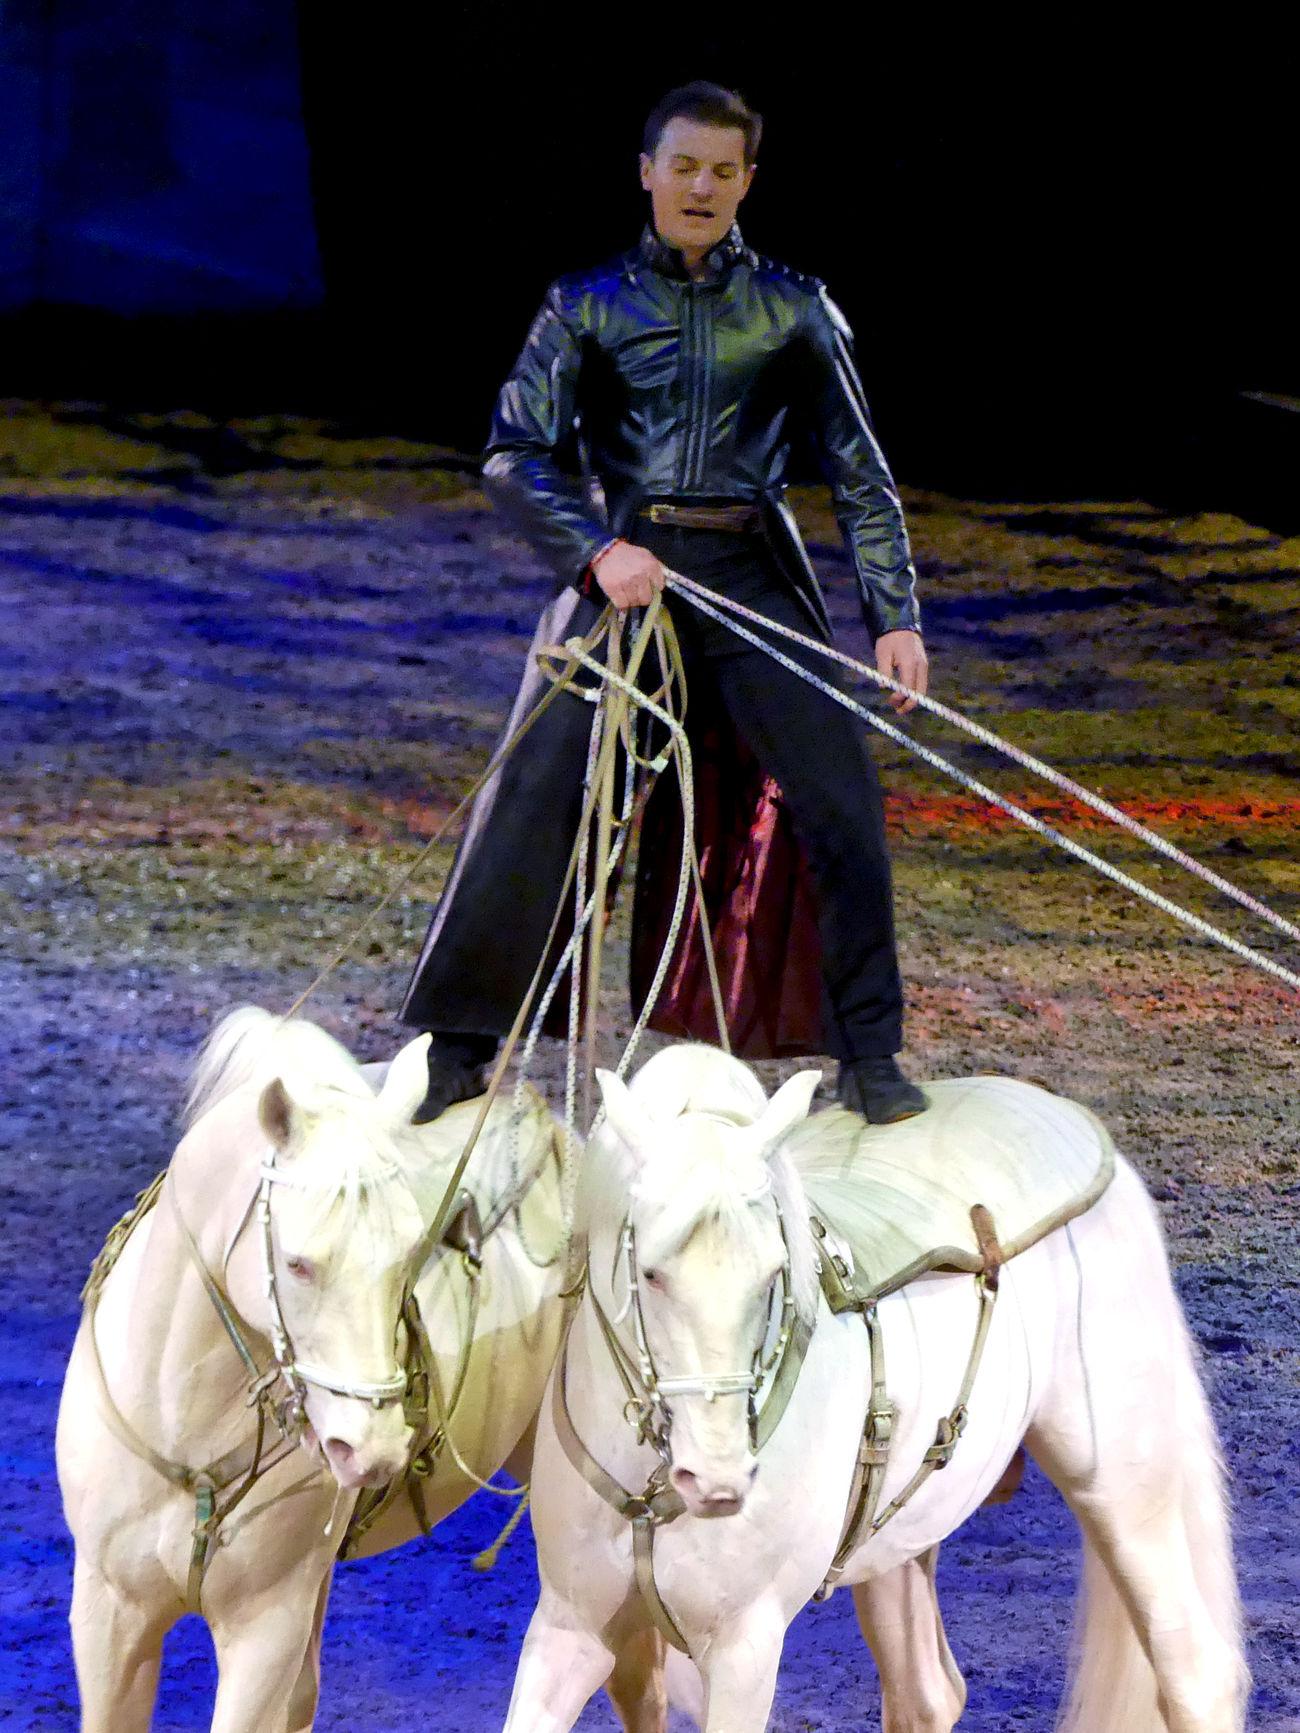 Apassionata Horse Show Man On Horseback Show Two Horses White Horses